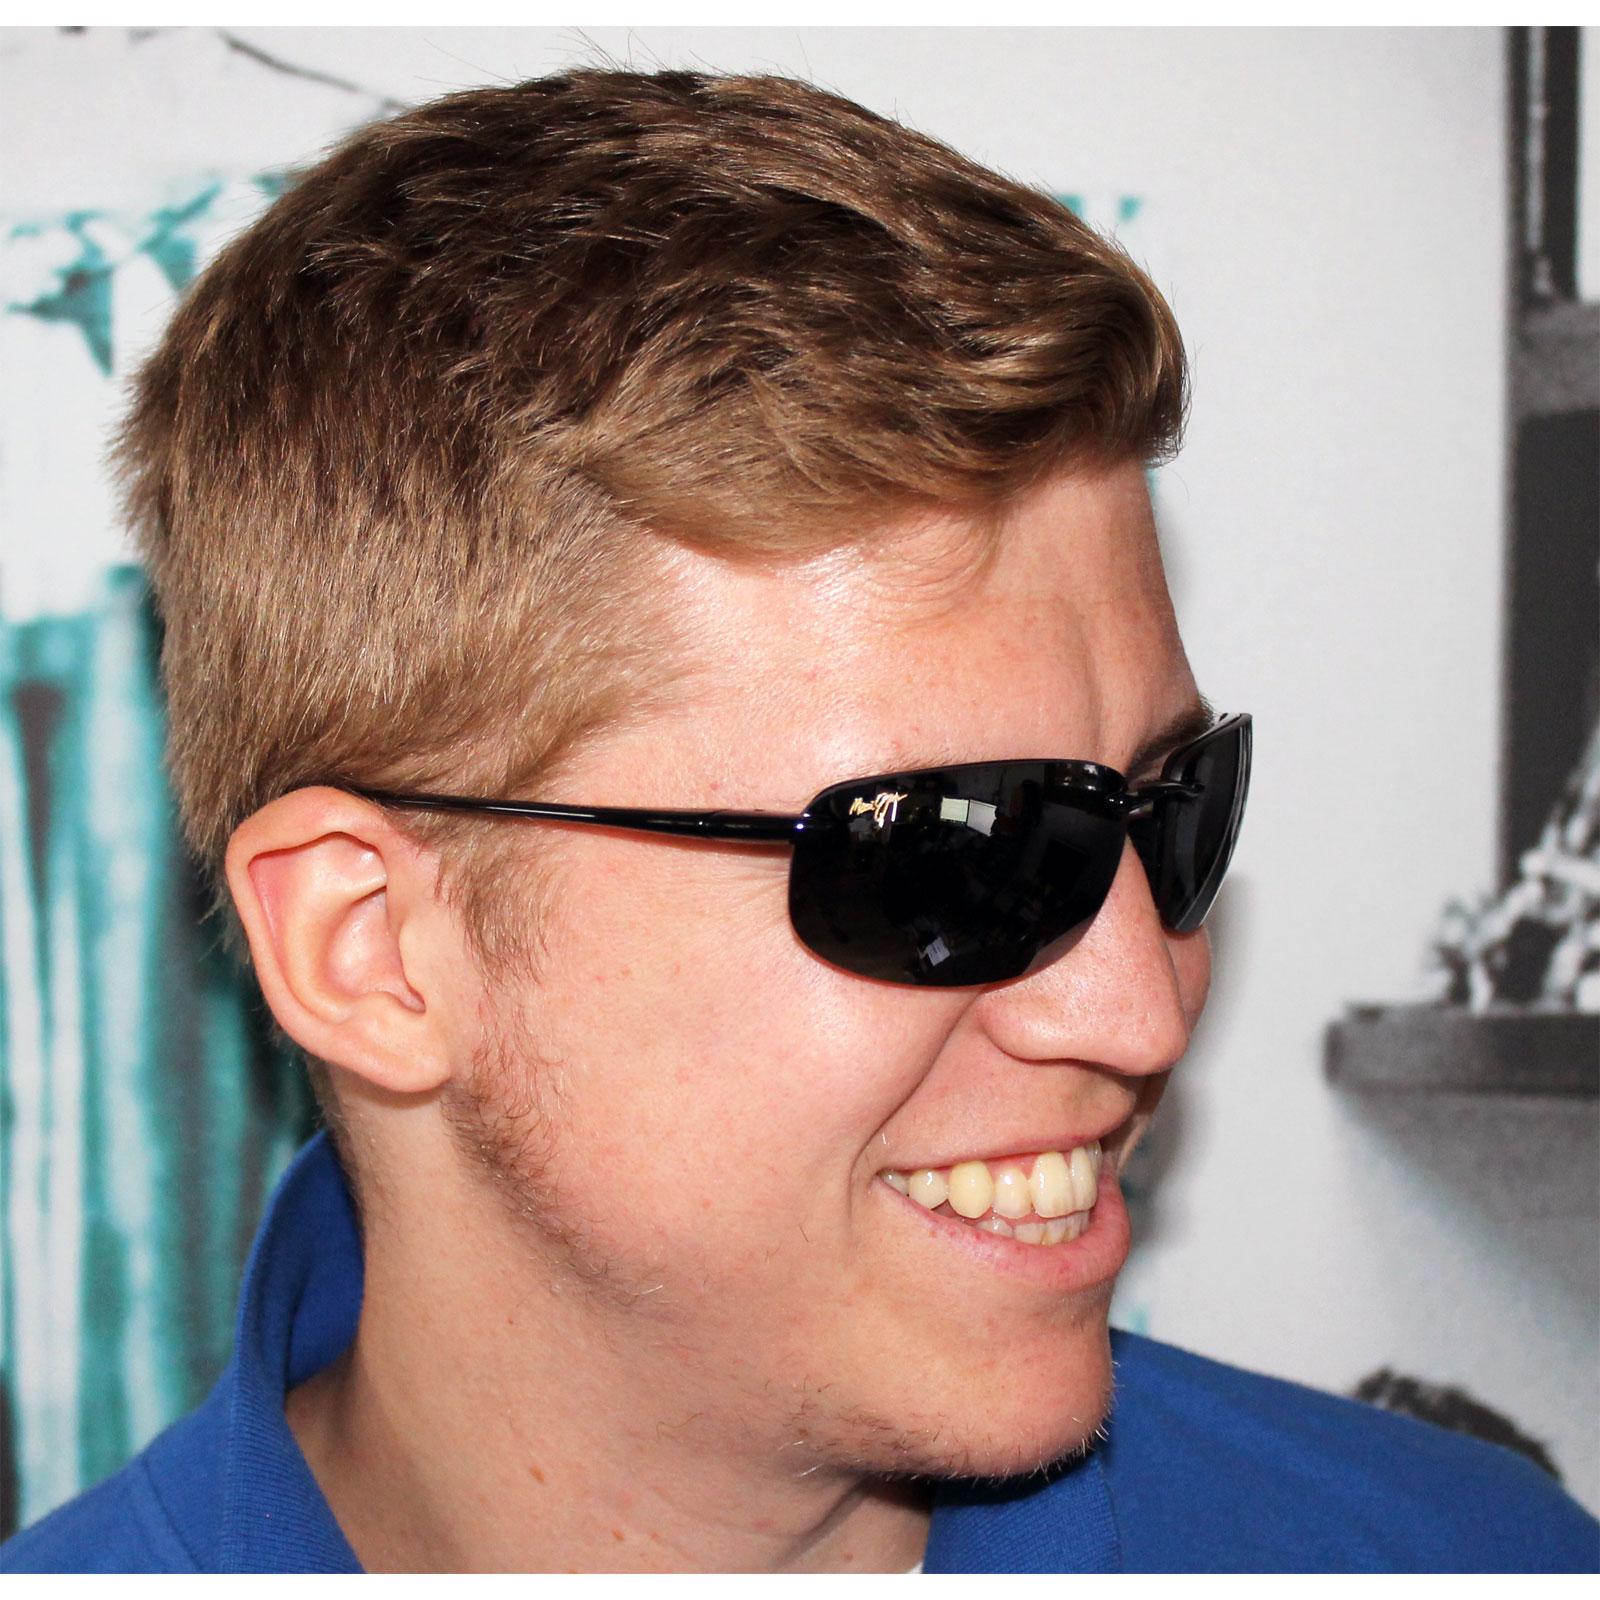 Maui Jim Sunglasses Ebay  maui jim sunglasses hookipa 407 02 gloss black grey polarized ebay